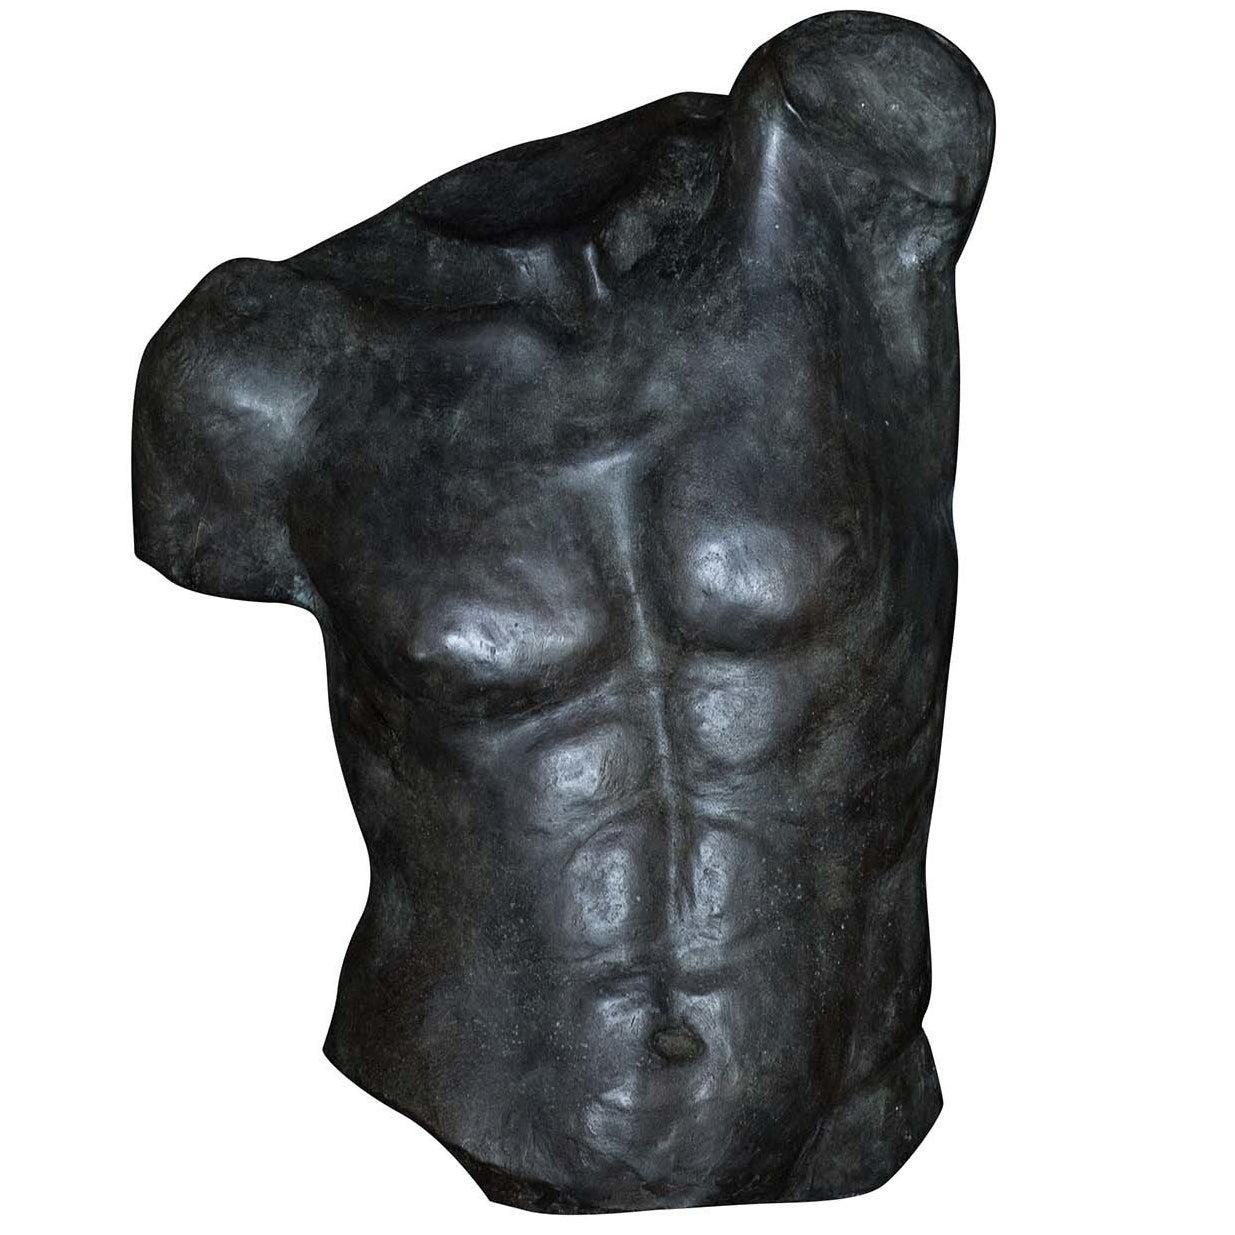 Fauno Torso Bronze Sculpture